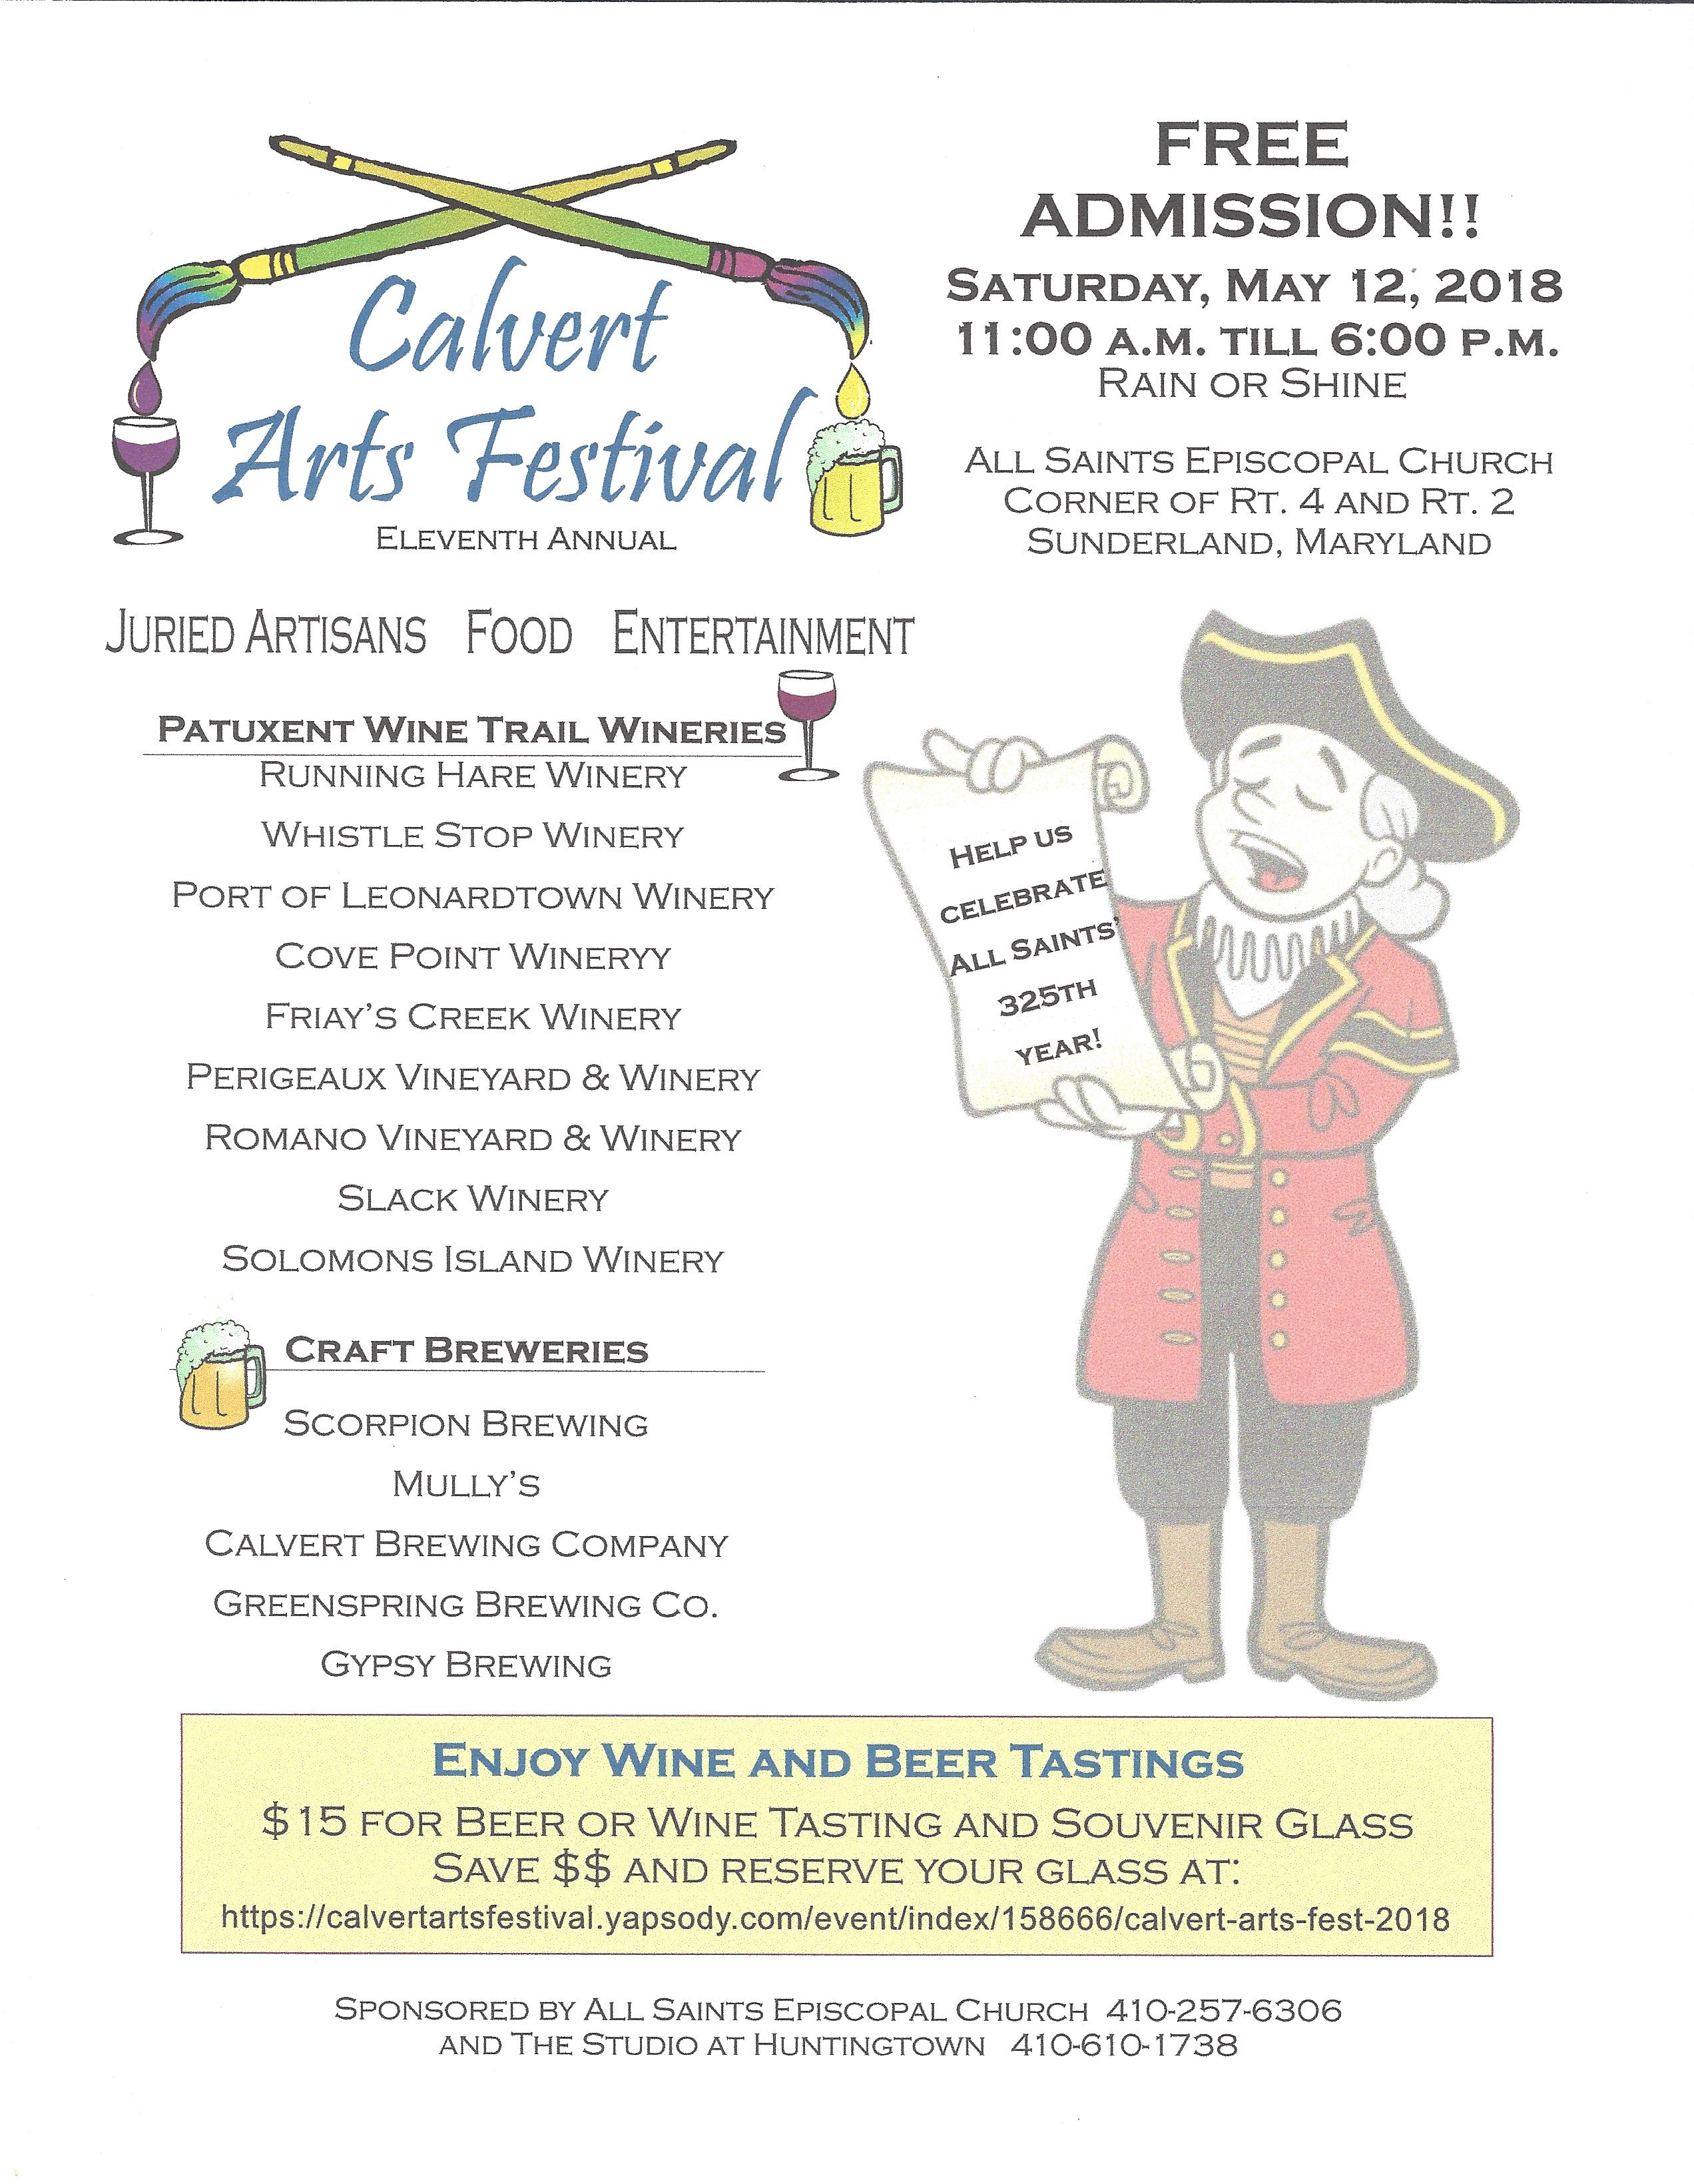 Calvert Arts Festival 2018 flyer